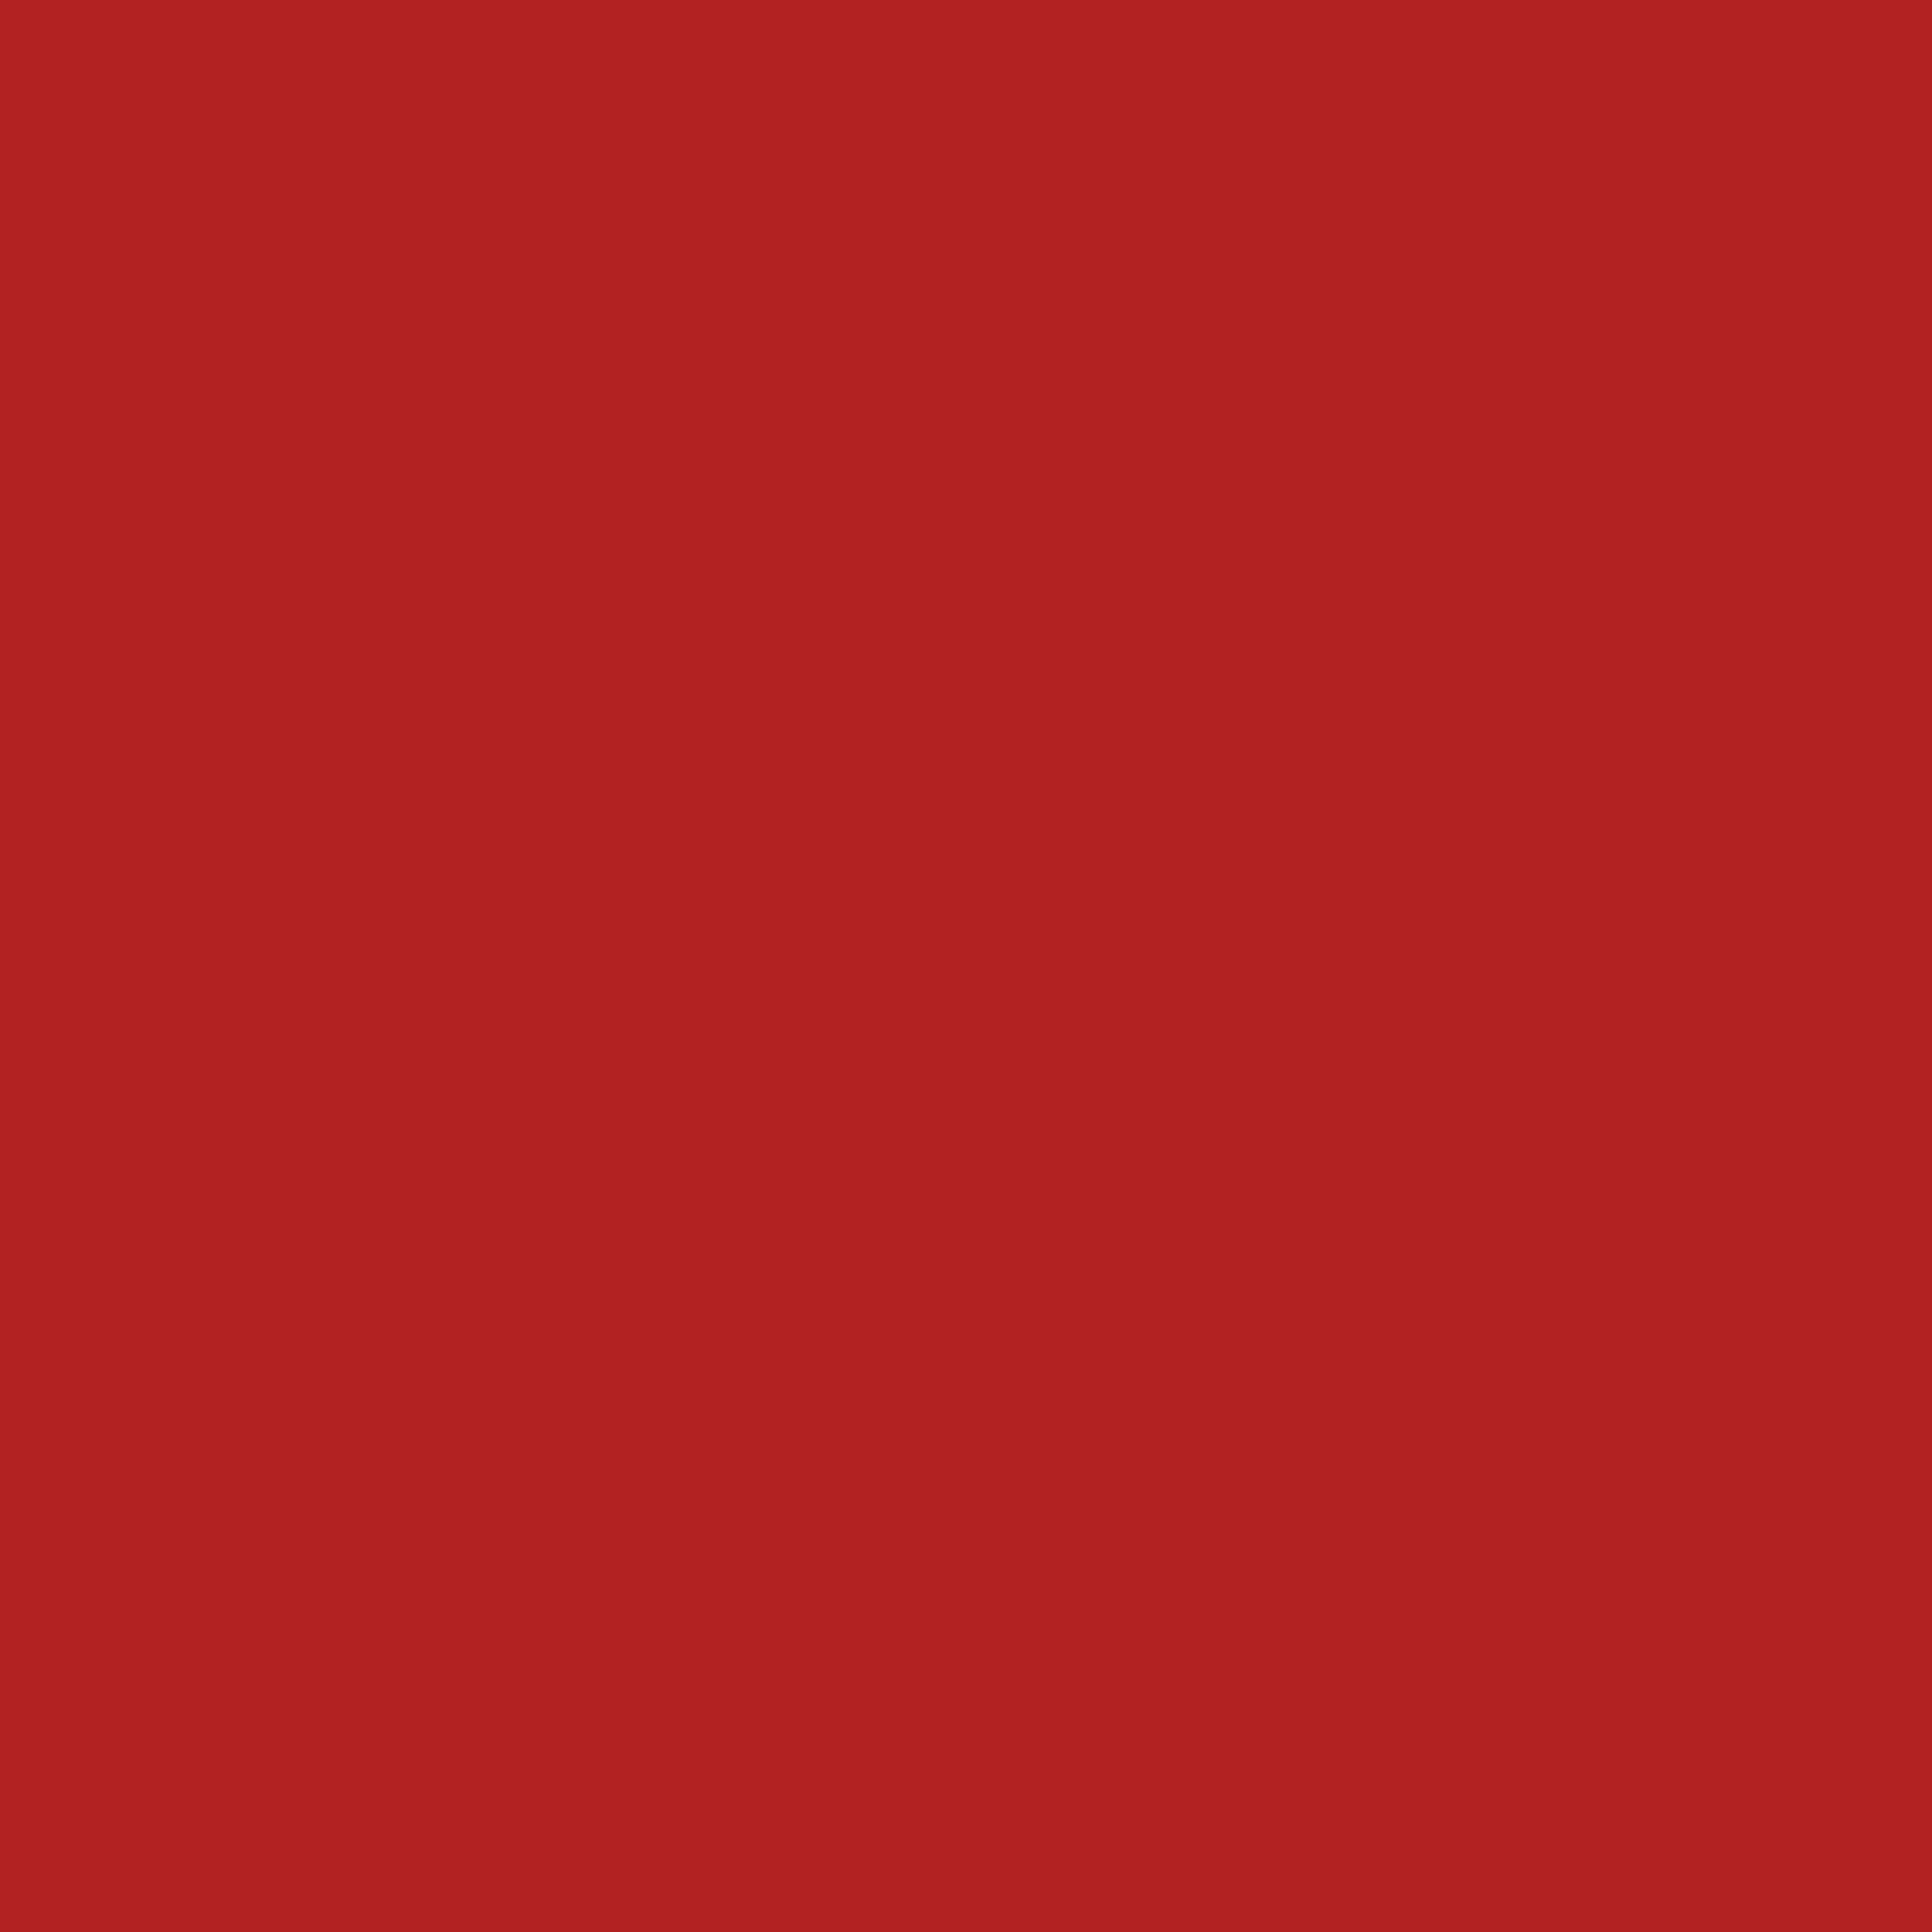 2732x2732 Firebrick Solid Color Background